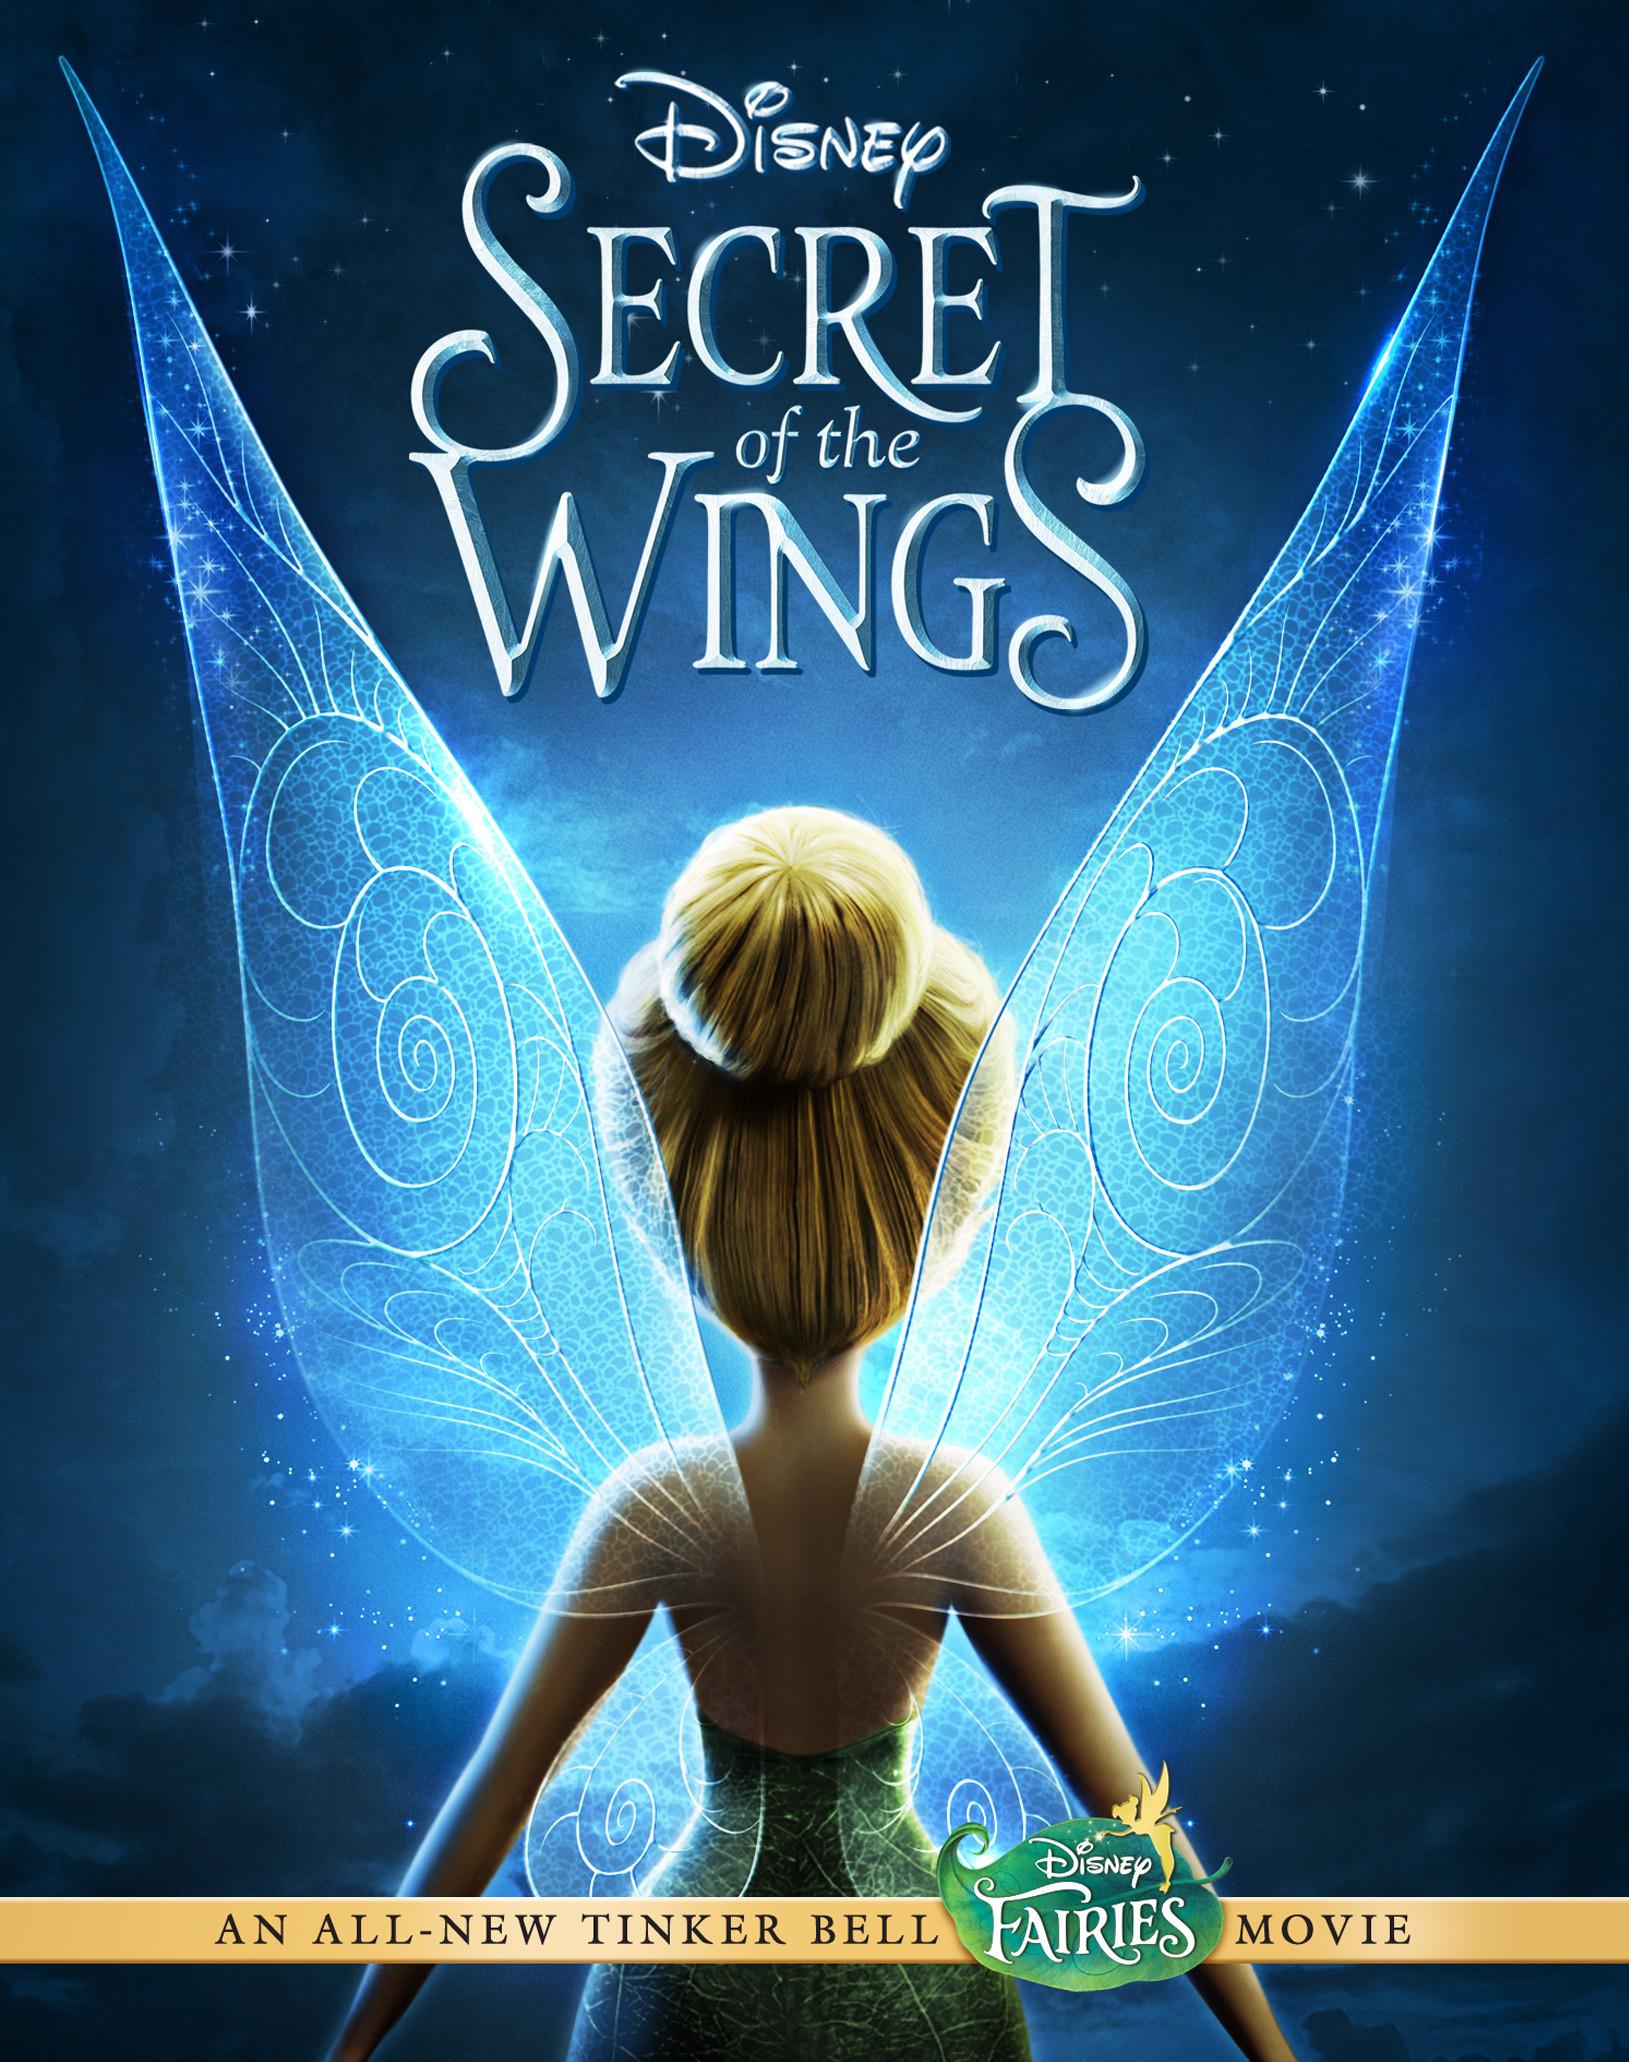 disney-secret-of-the-wings-poster